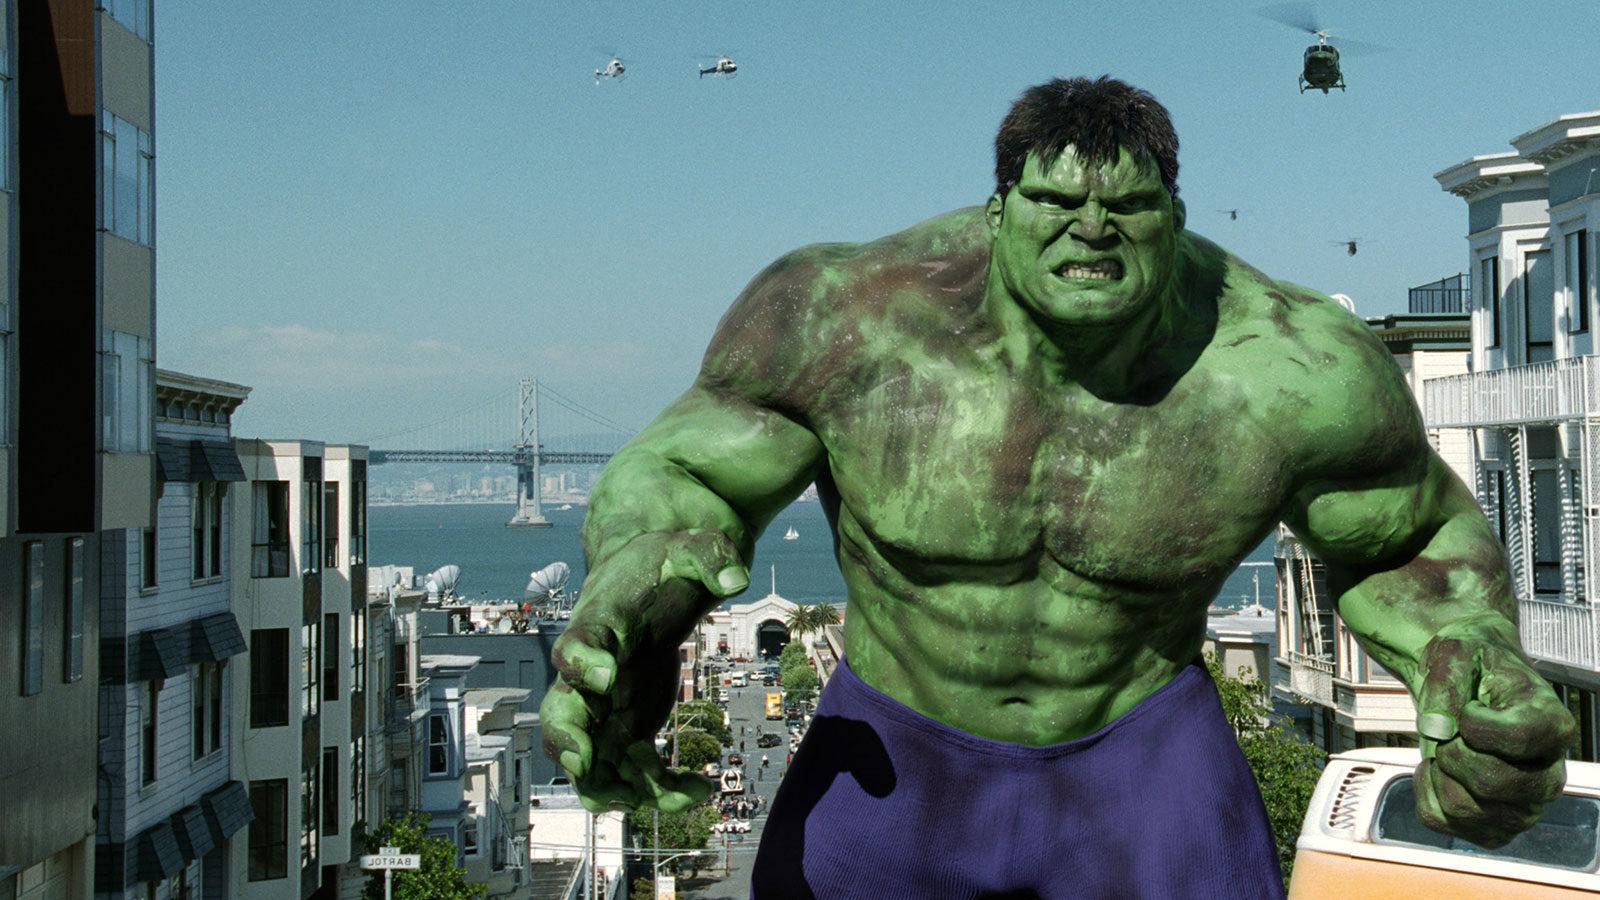 ang-lee-hulk-feature-1600x900-c-default.jpg